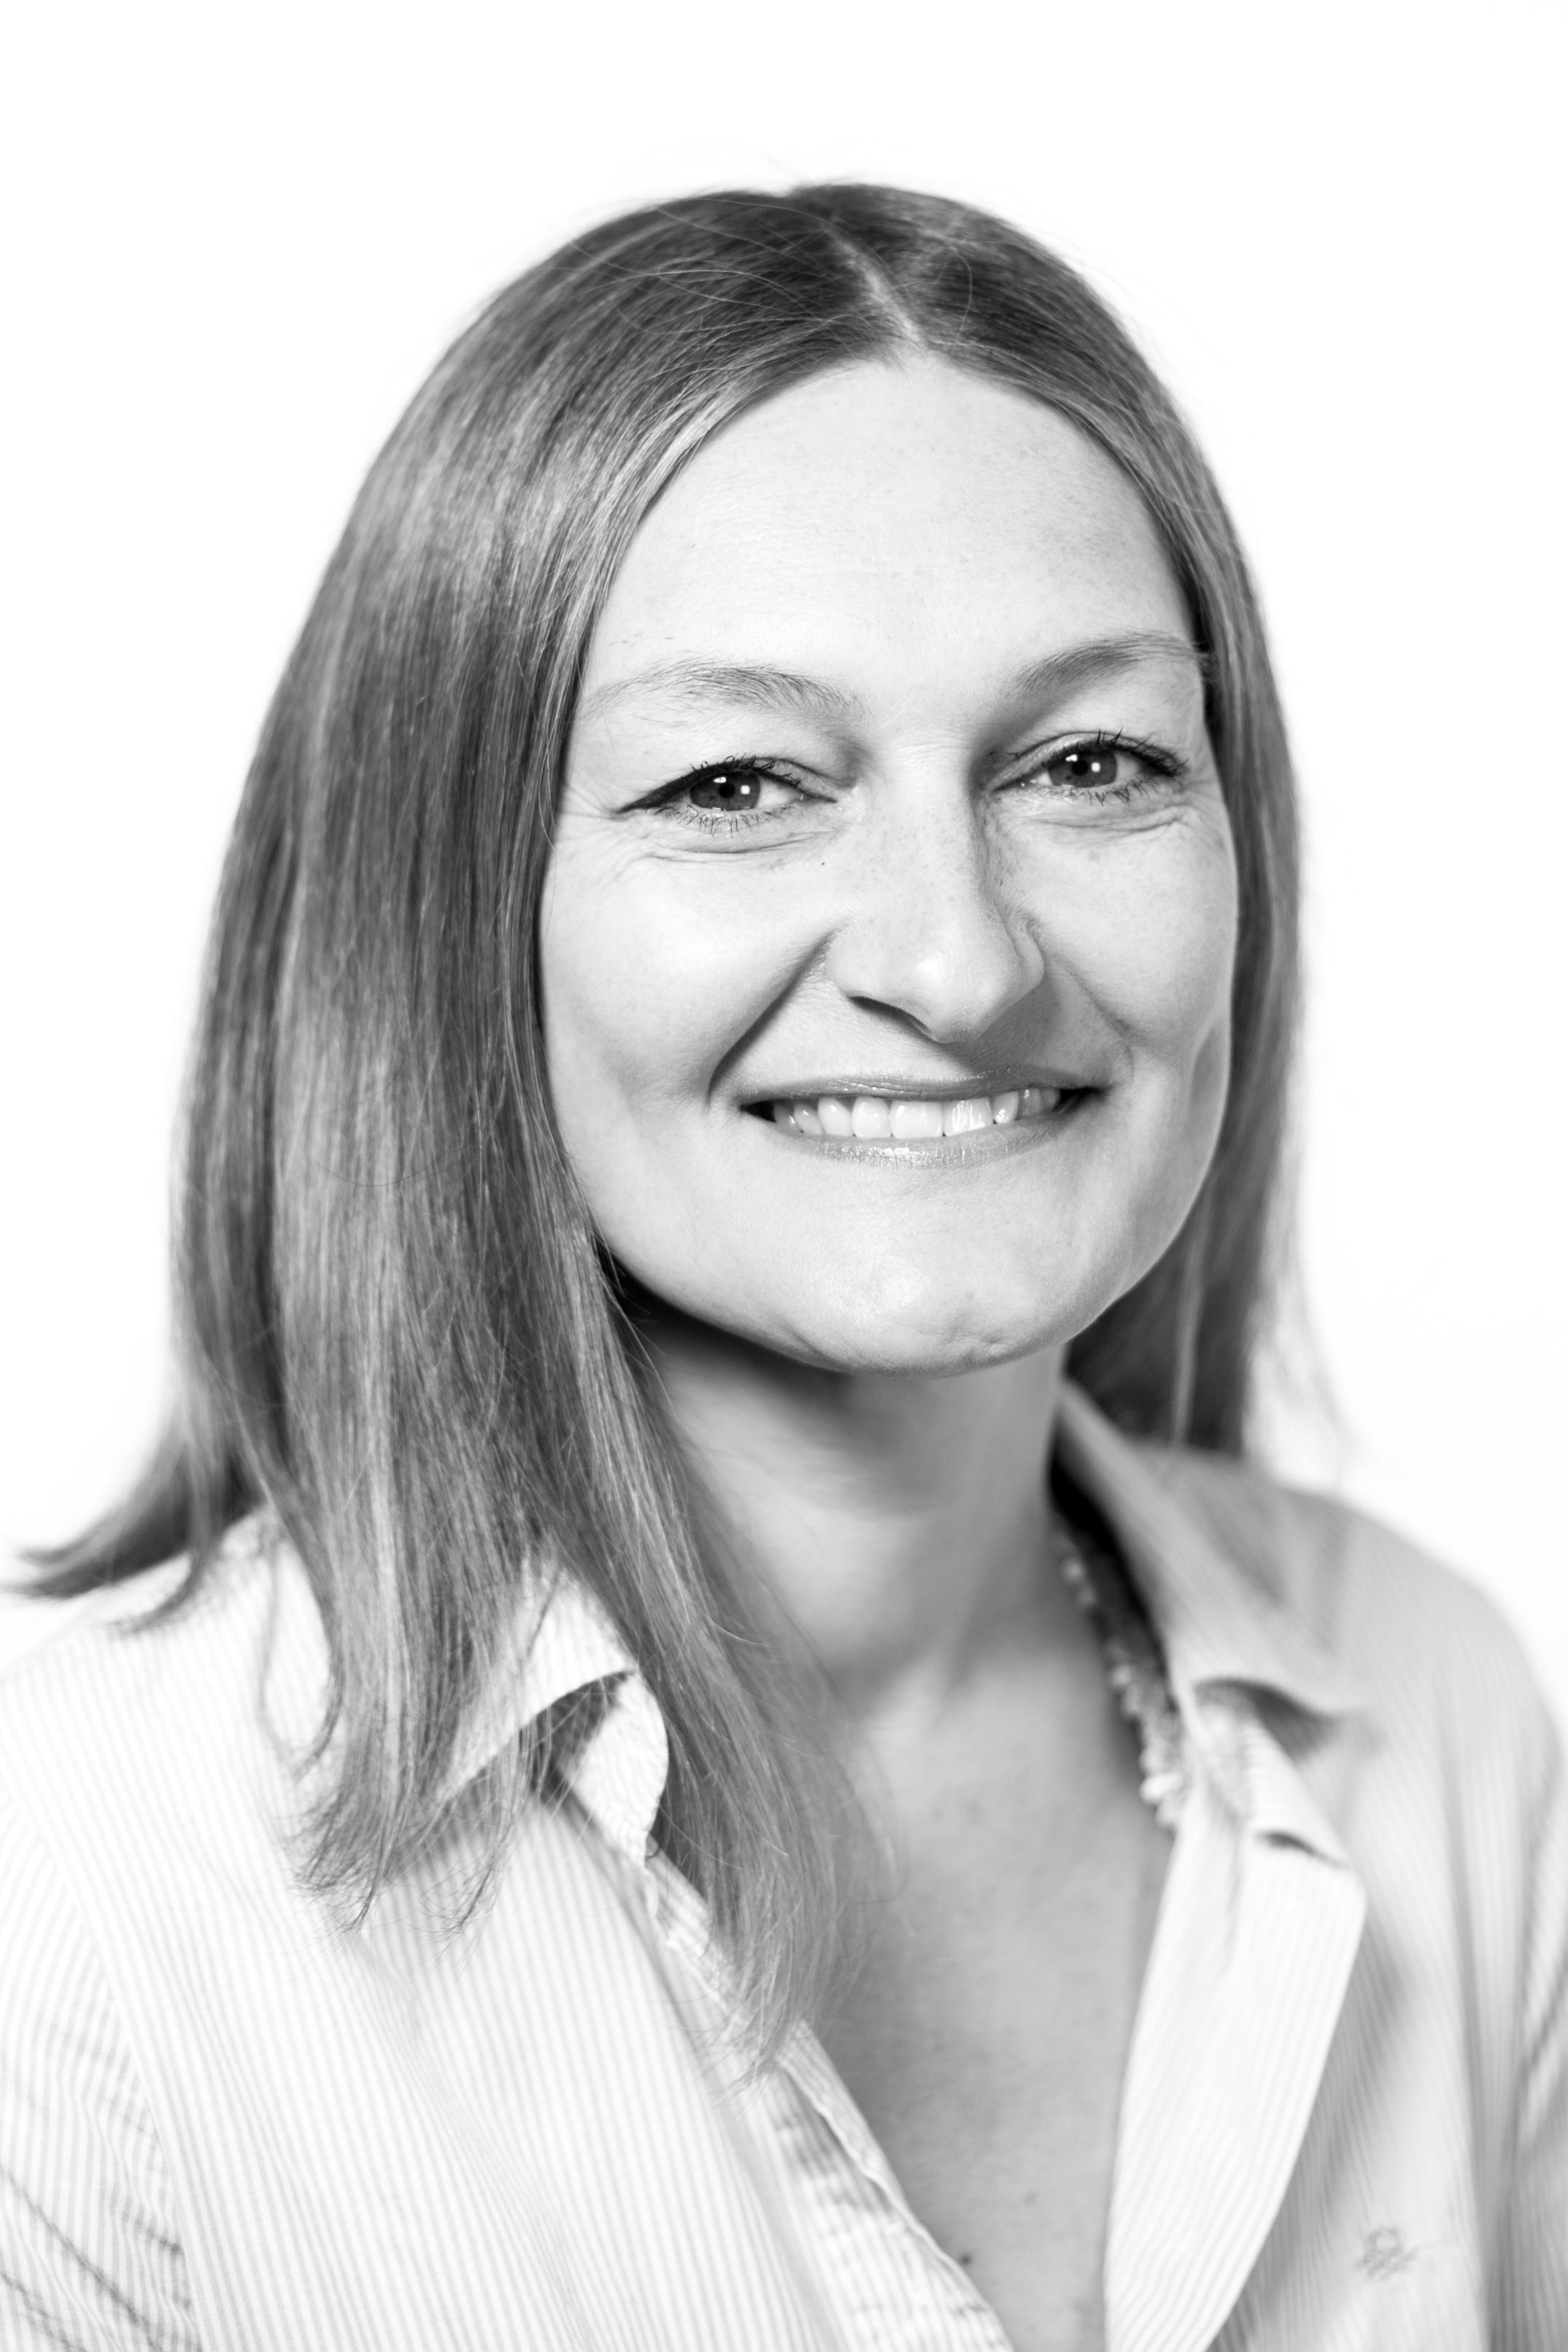 Anke Richwien